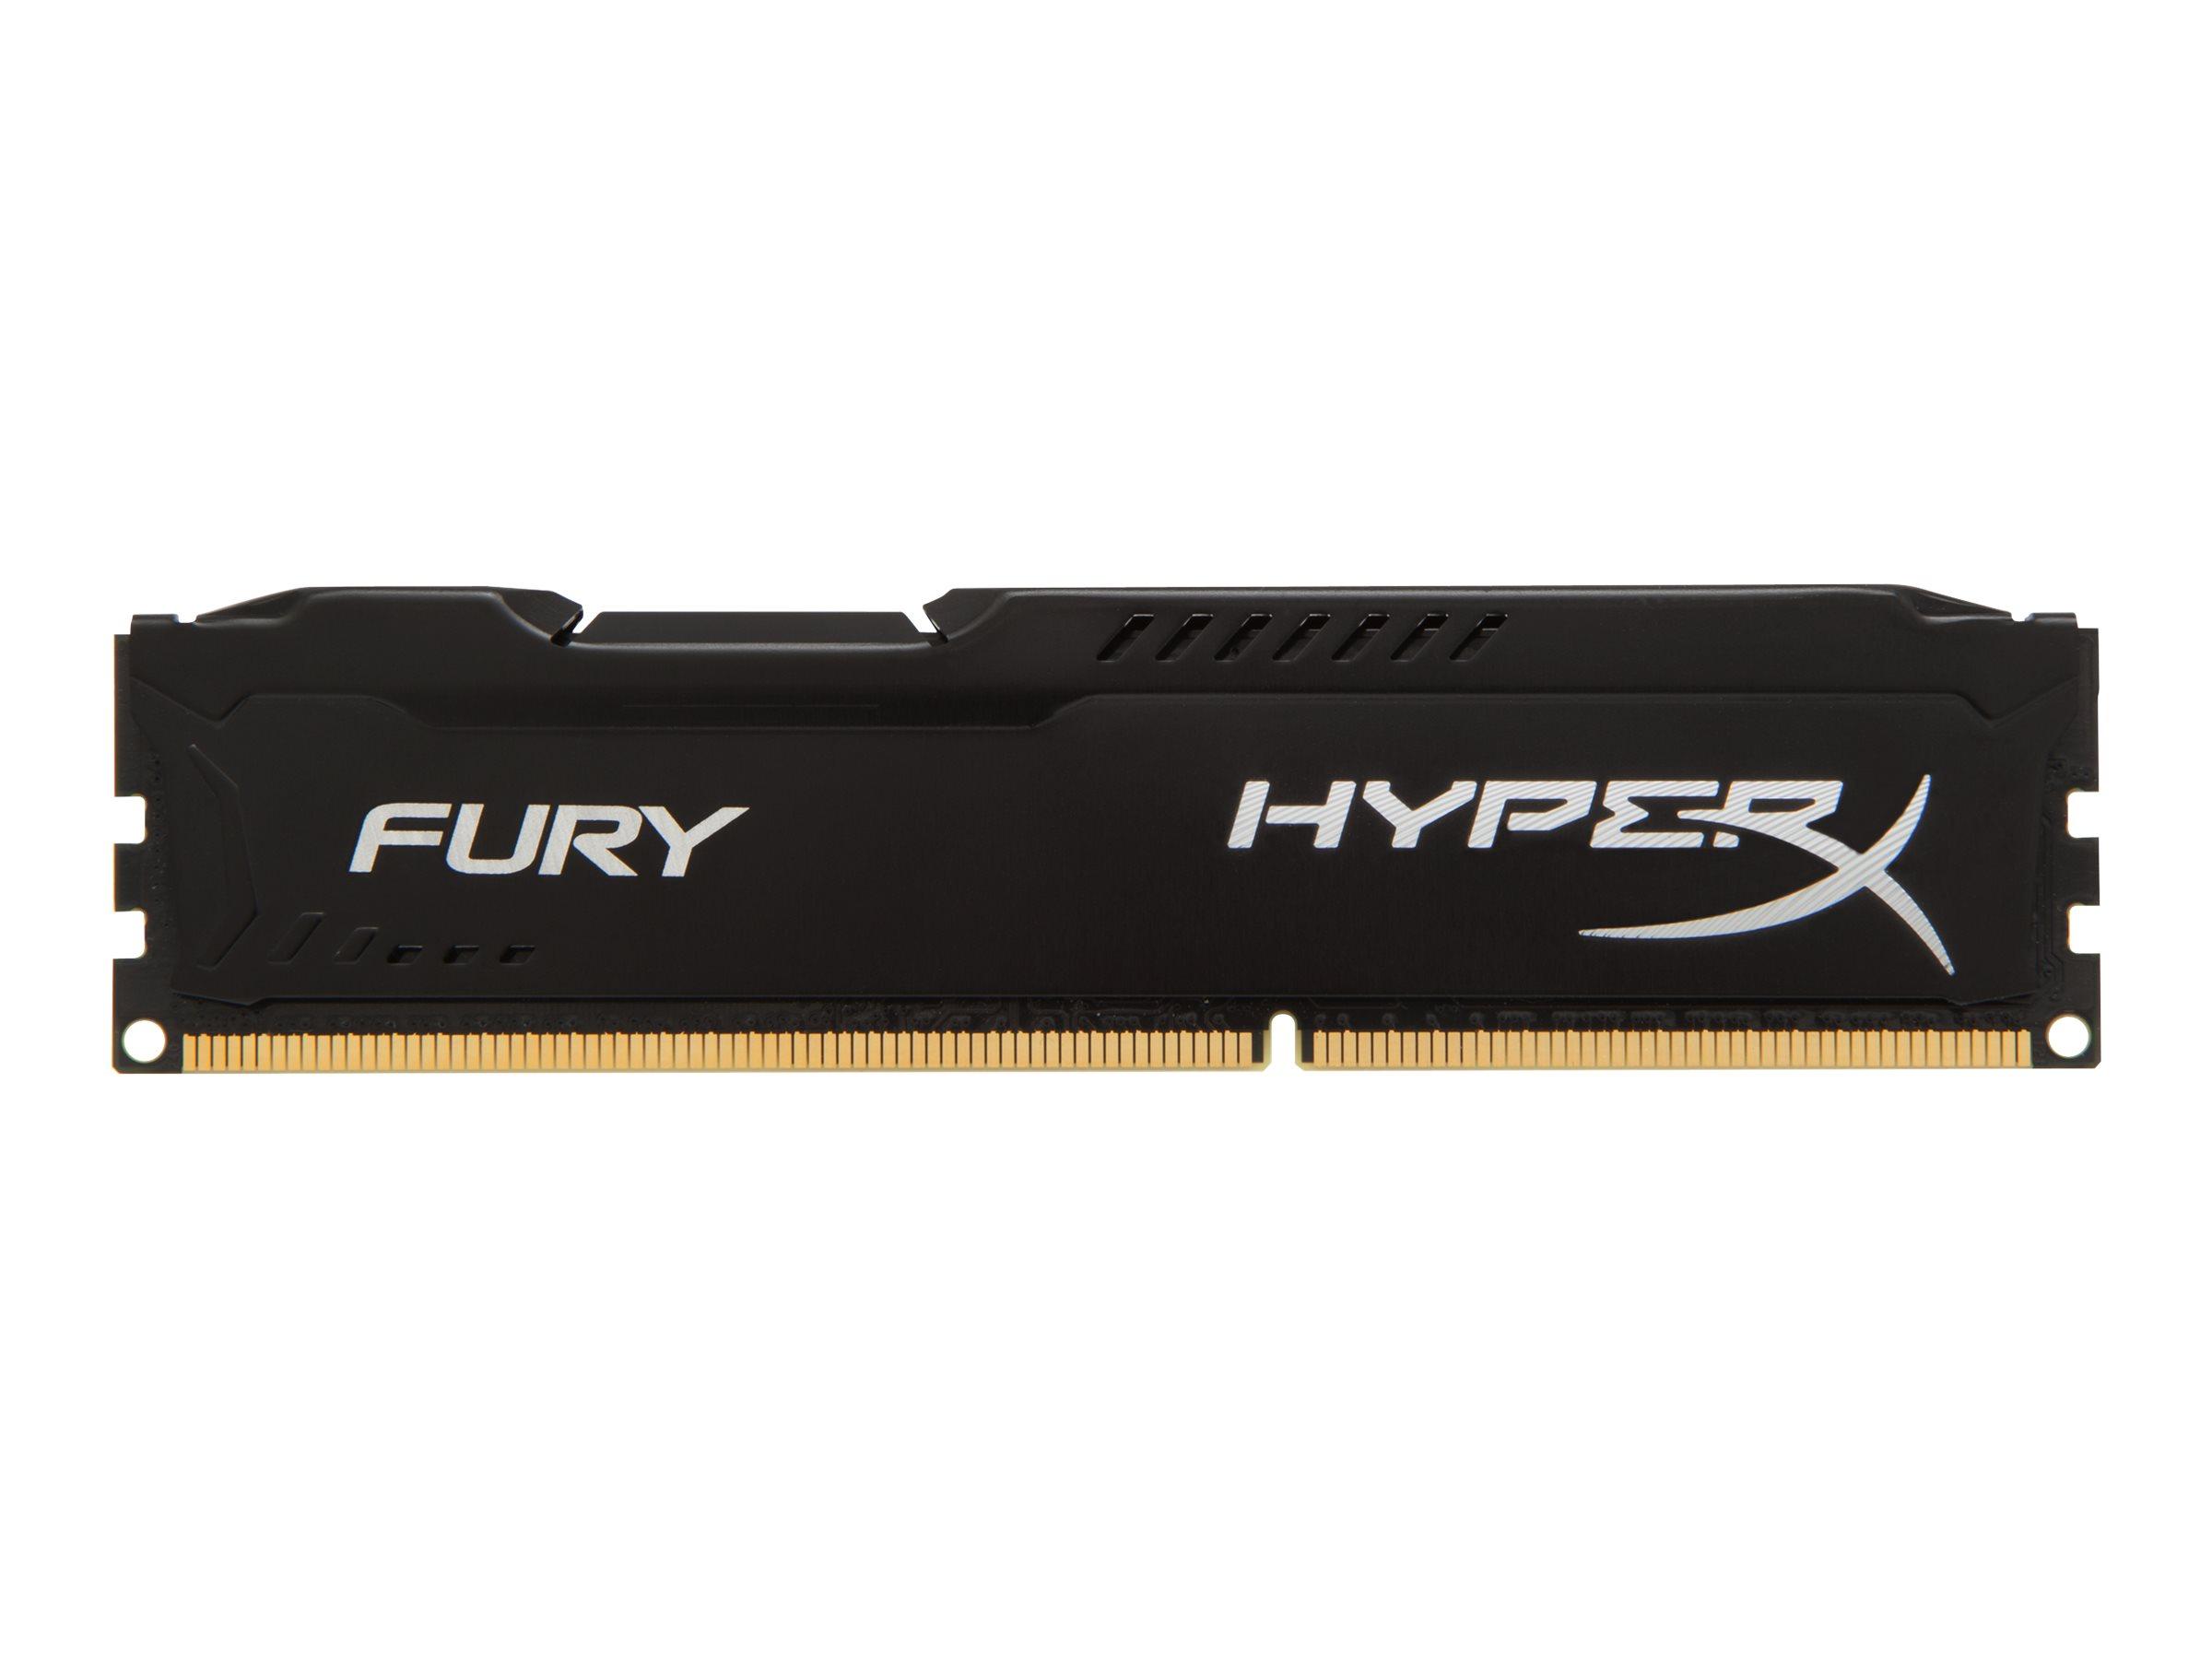 HyperX FURY - DDR3 - 8 GB: 2 x 4 GB - DIMM 240-PIN - 1600 MHz / PC3-12800 - CL10